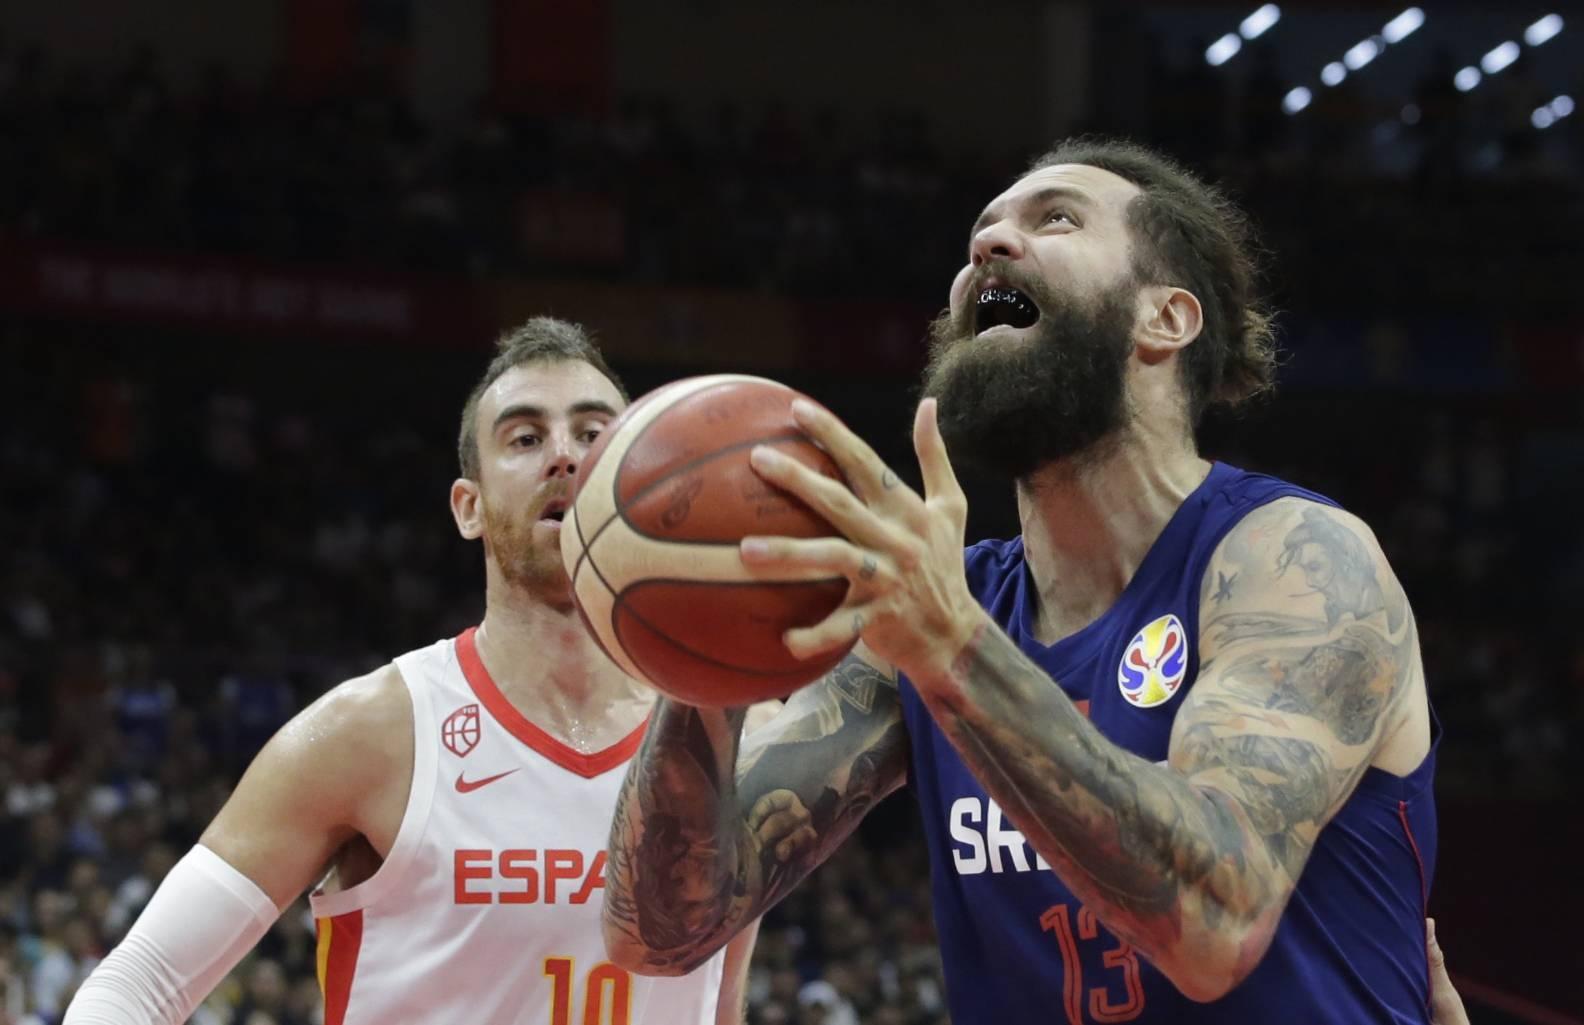 Basketball - FIBA World Cup - Second Round - Group J - Spain v Serbia